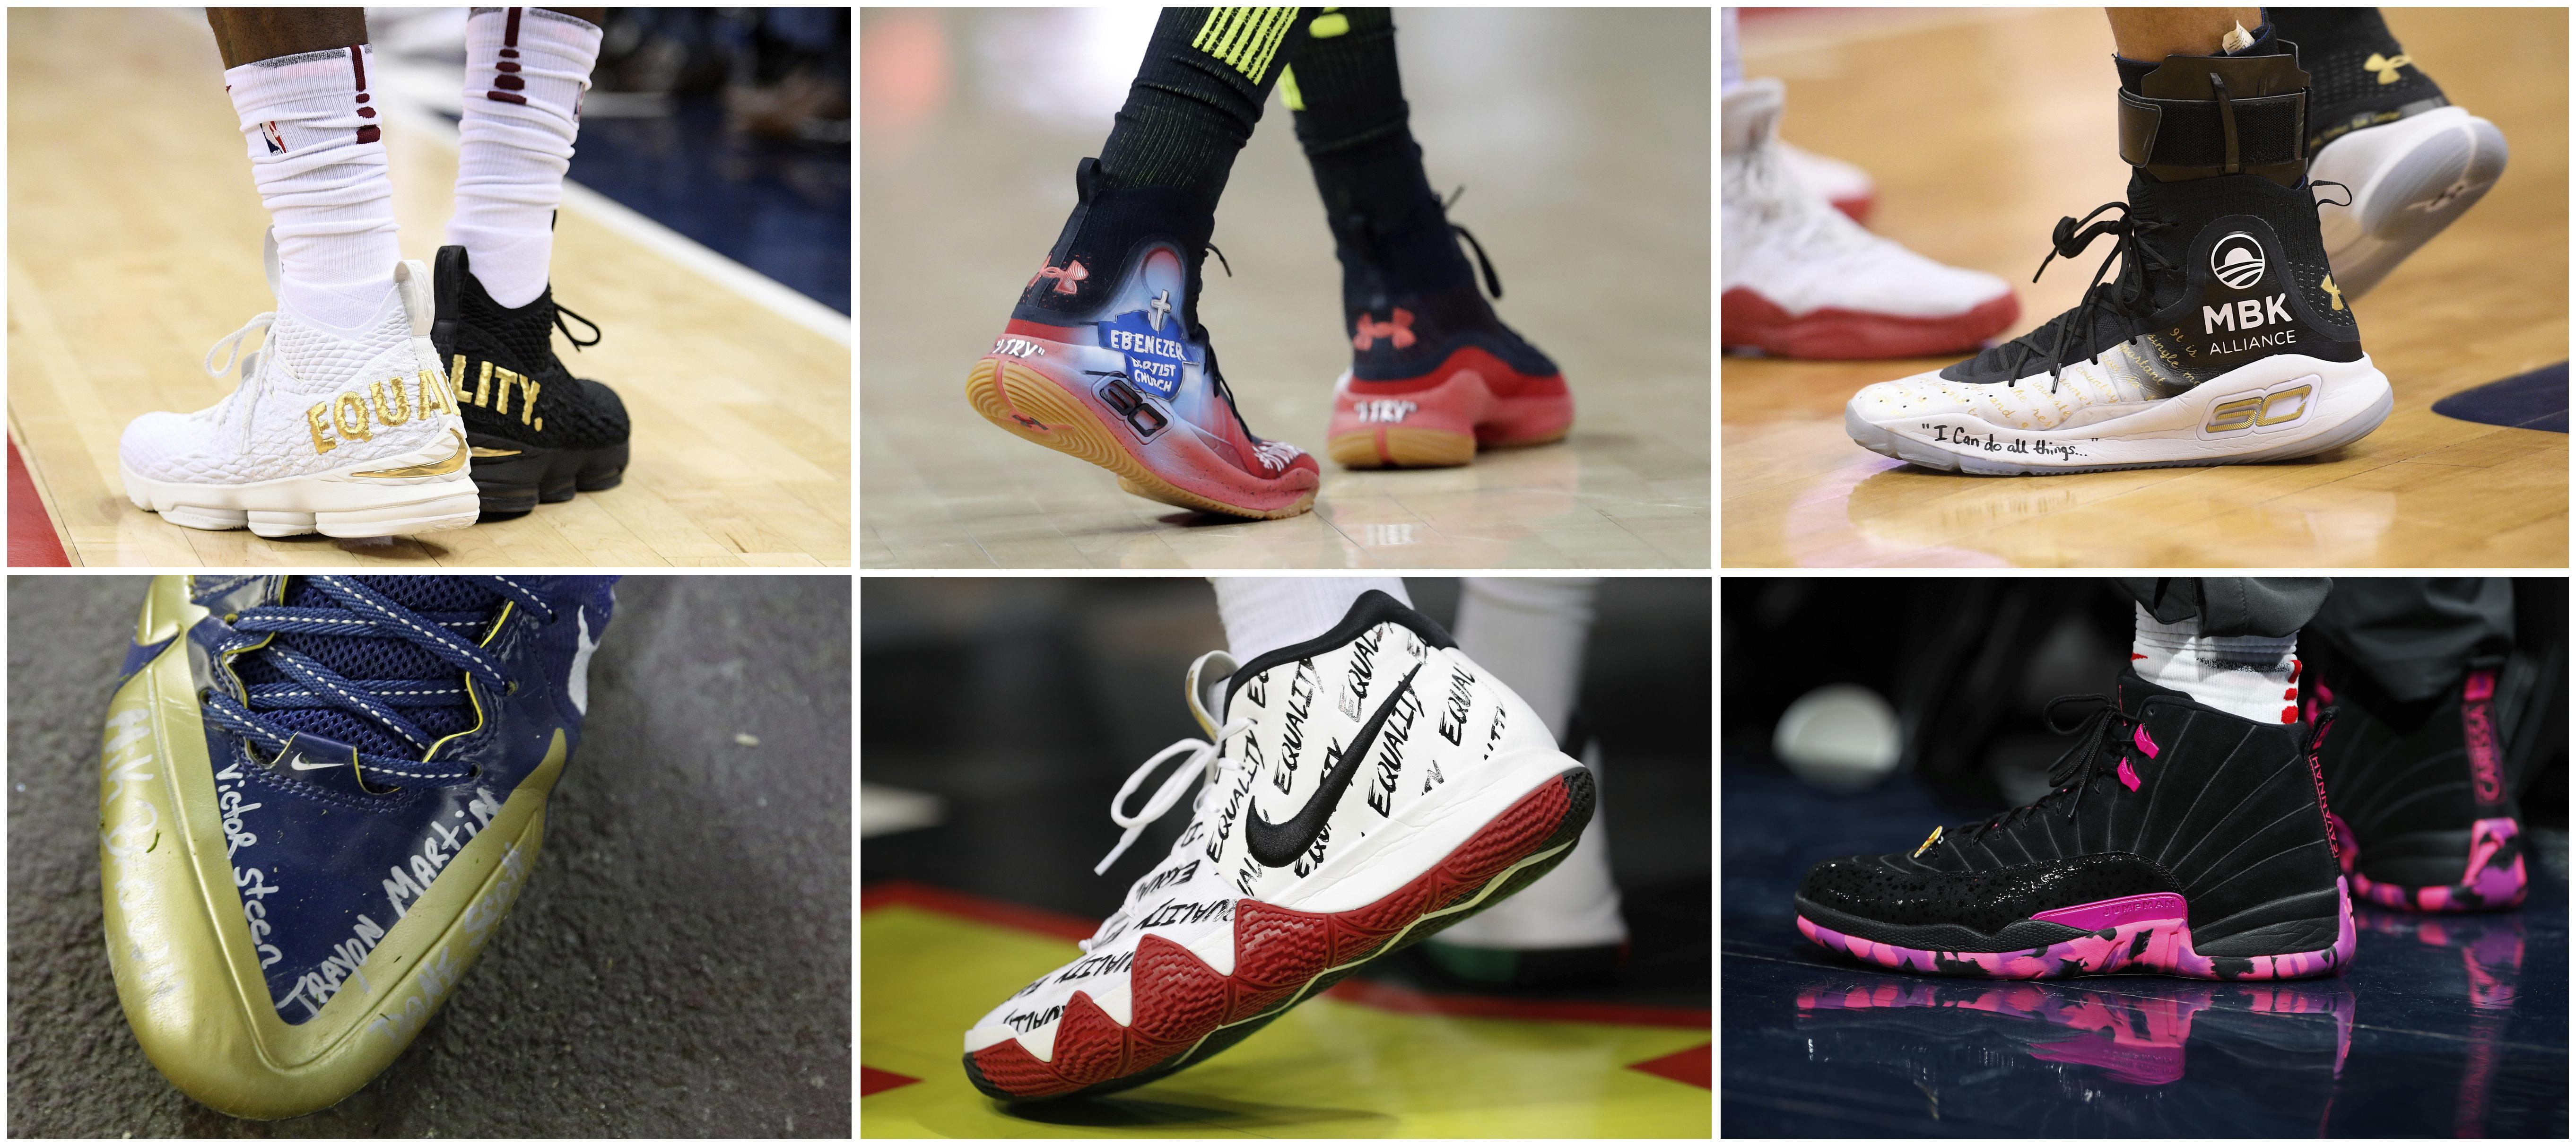 8cbd6cc80 Nike s Kaepernick campaign signals change in shoe politics